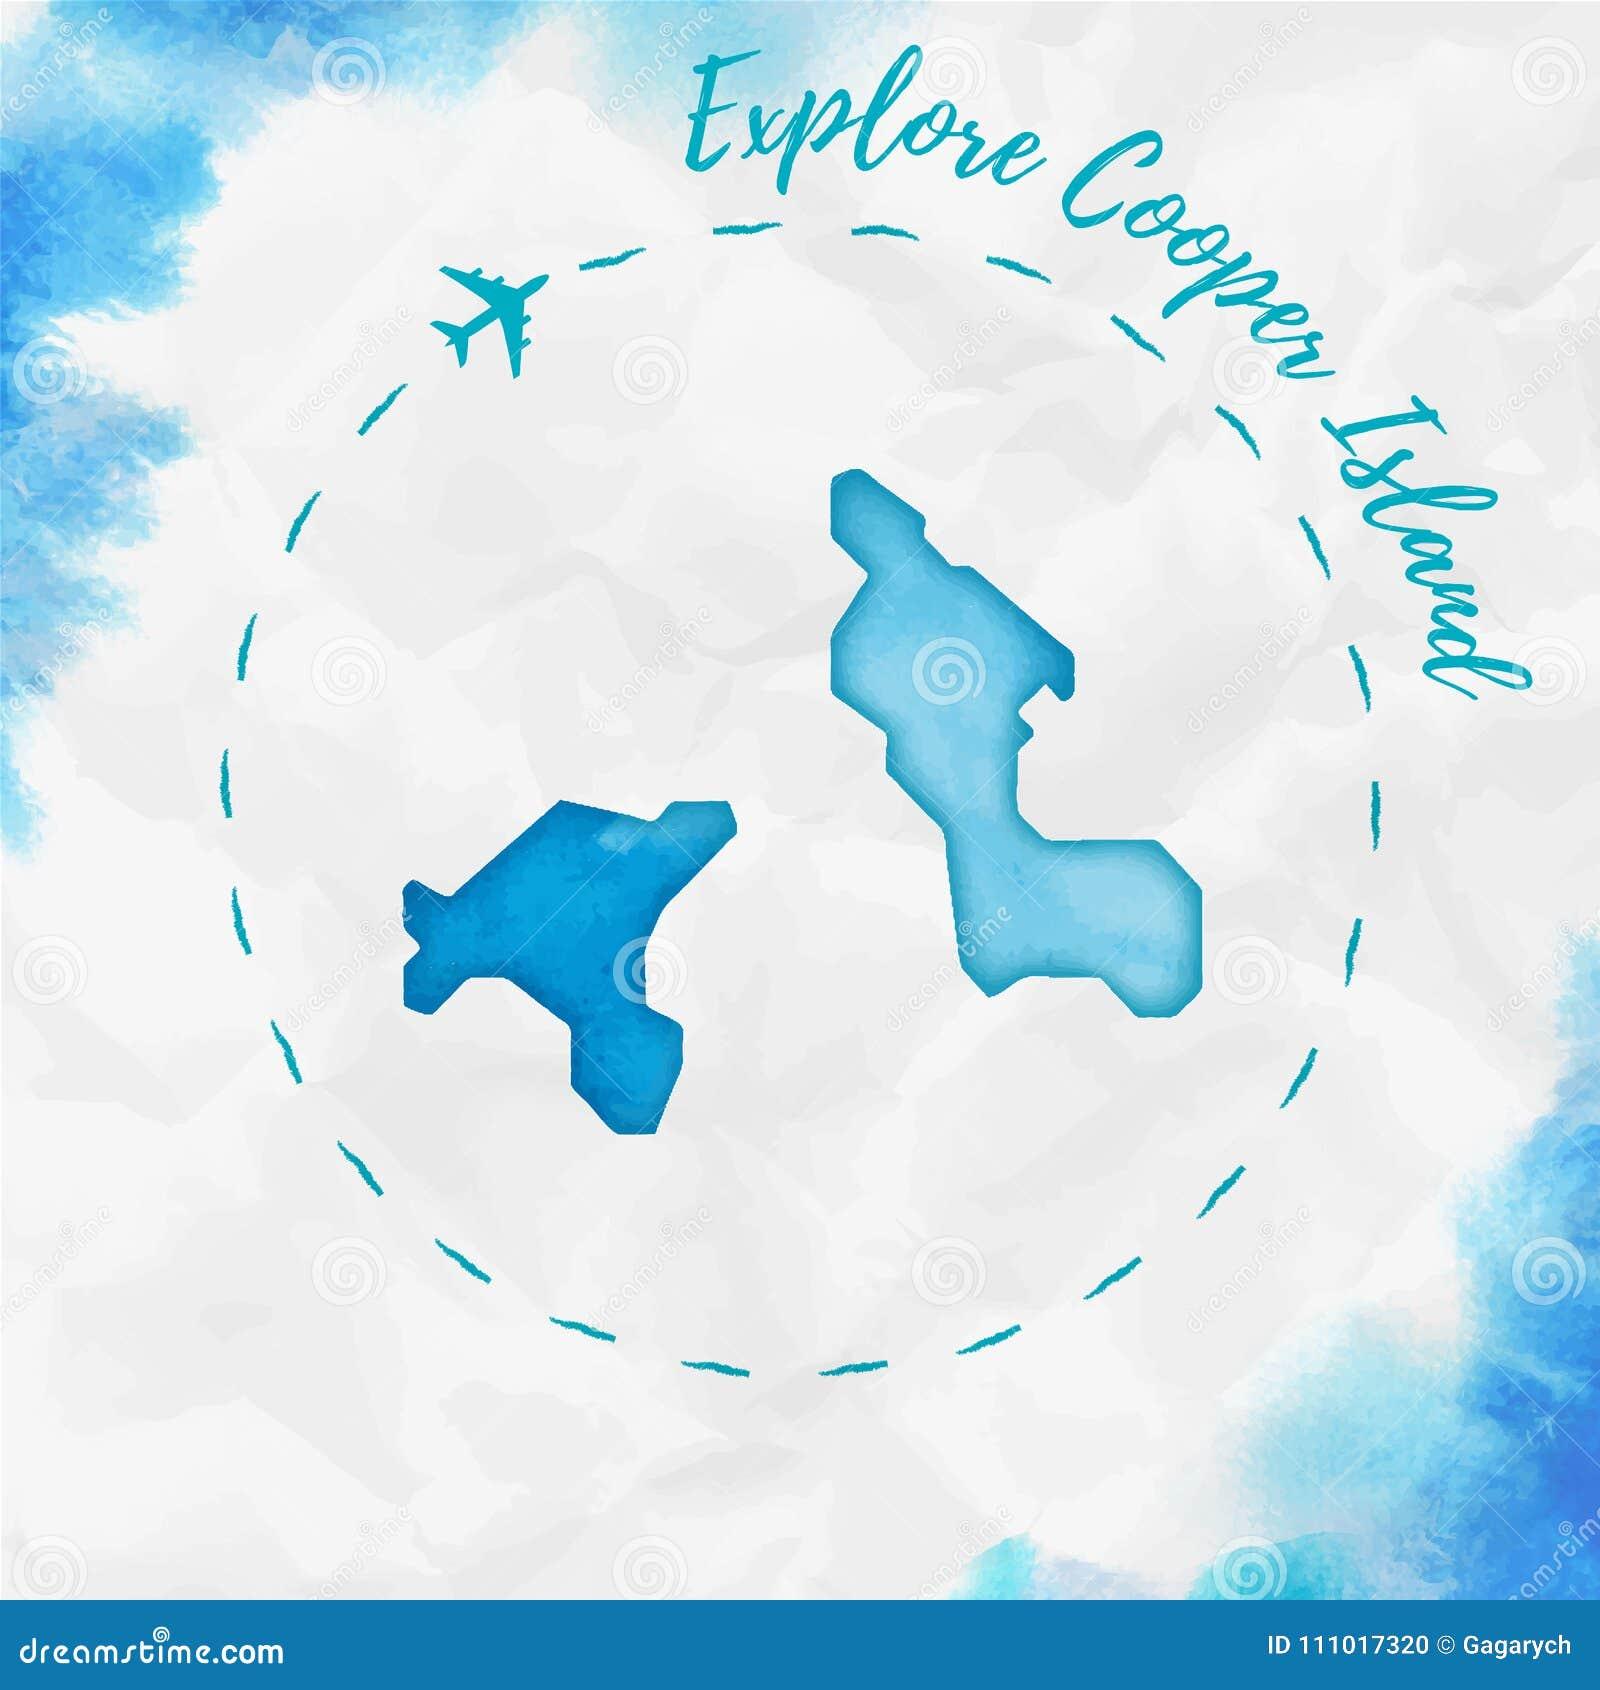 Cooper Island: Cooper Island Watercolor Island Map In Turquoise. Stock